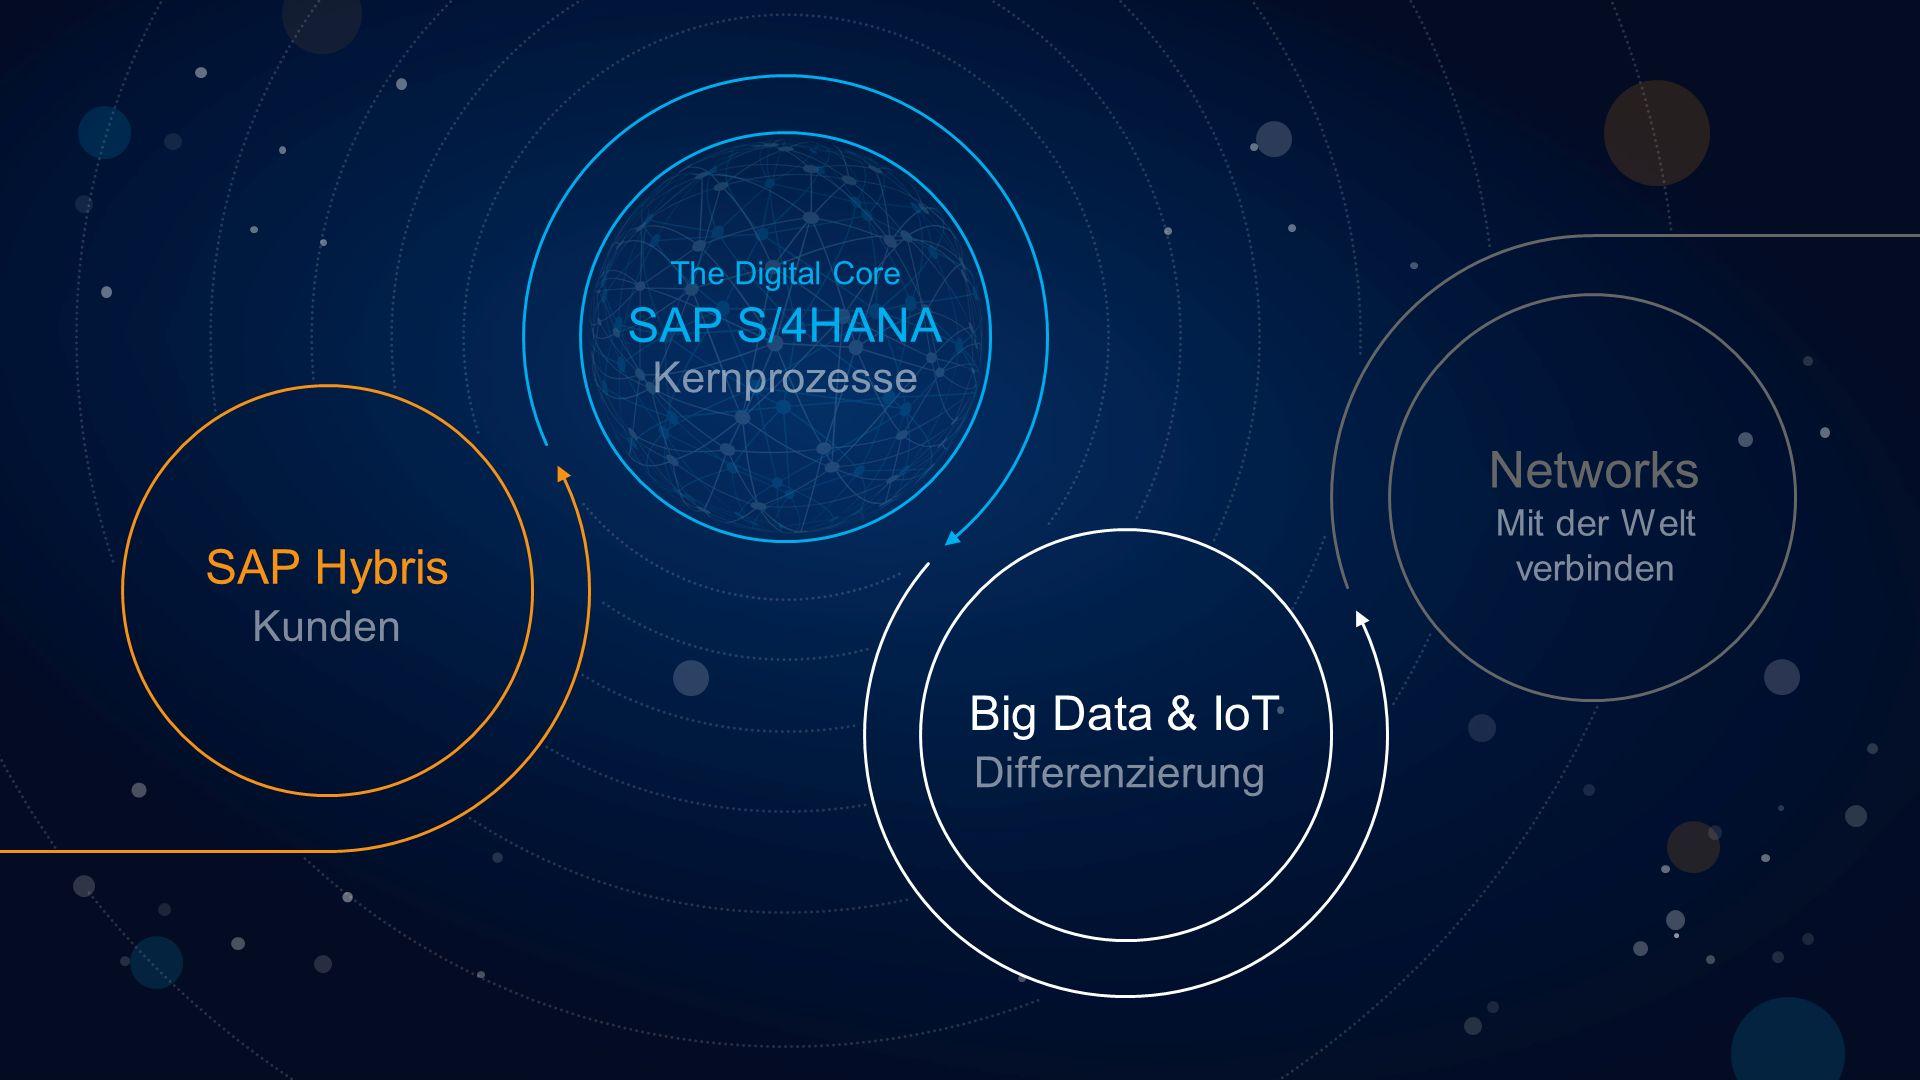 Networks SAP S/4HANA SAP Hybris Big Data & IoT Kernprozesse Kunden